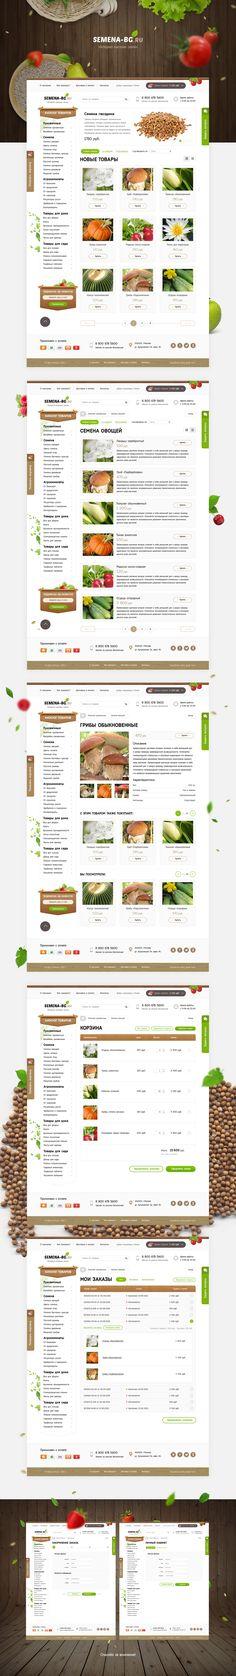 Web Design Inspiration, Creative Inspiration, Restaurant Web, Behance, Internet, Ecommerce, Templates, Website, Design Web